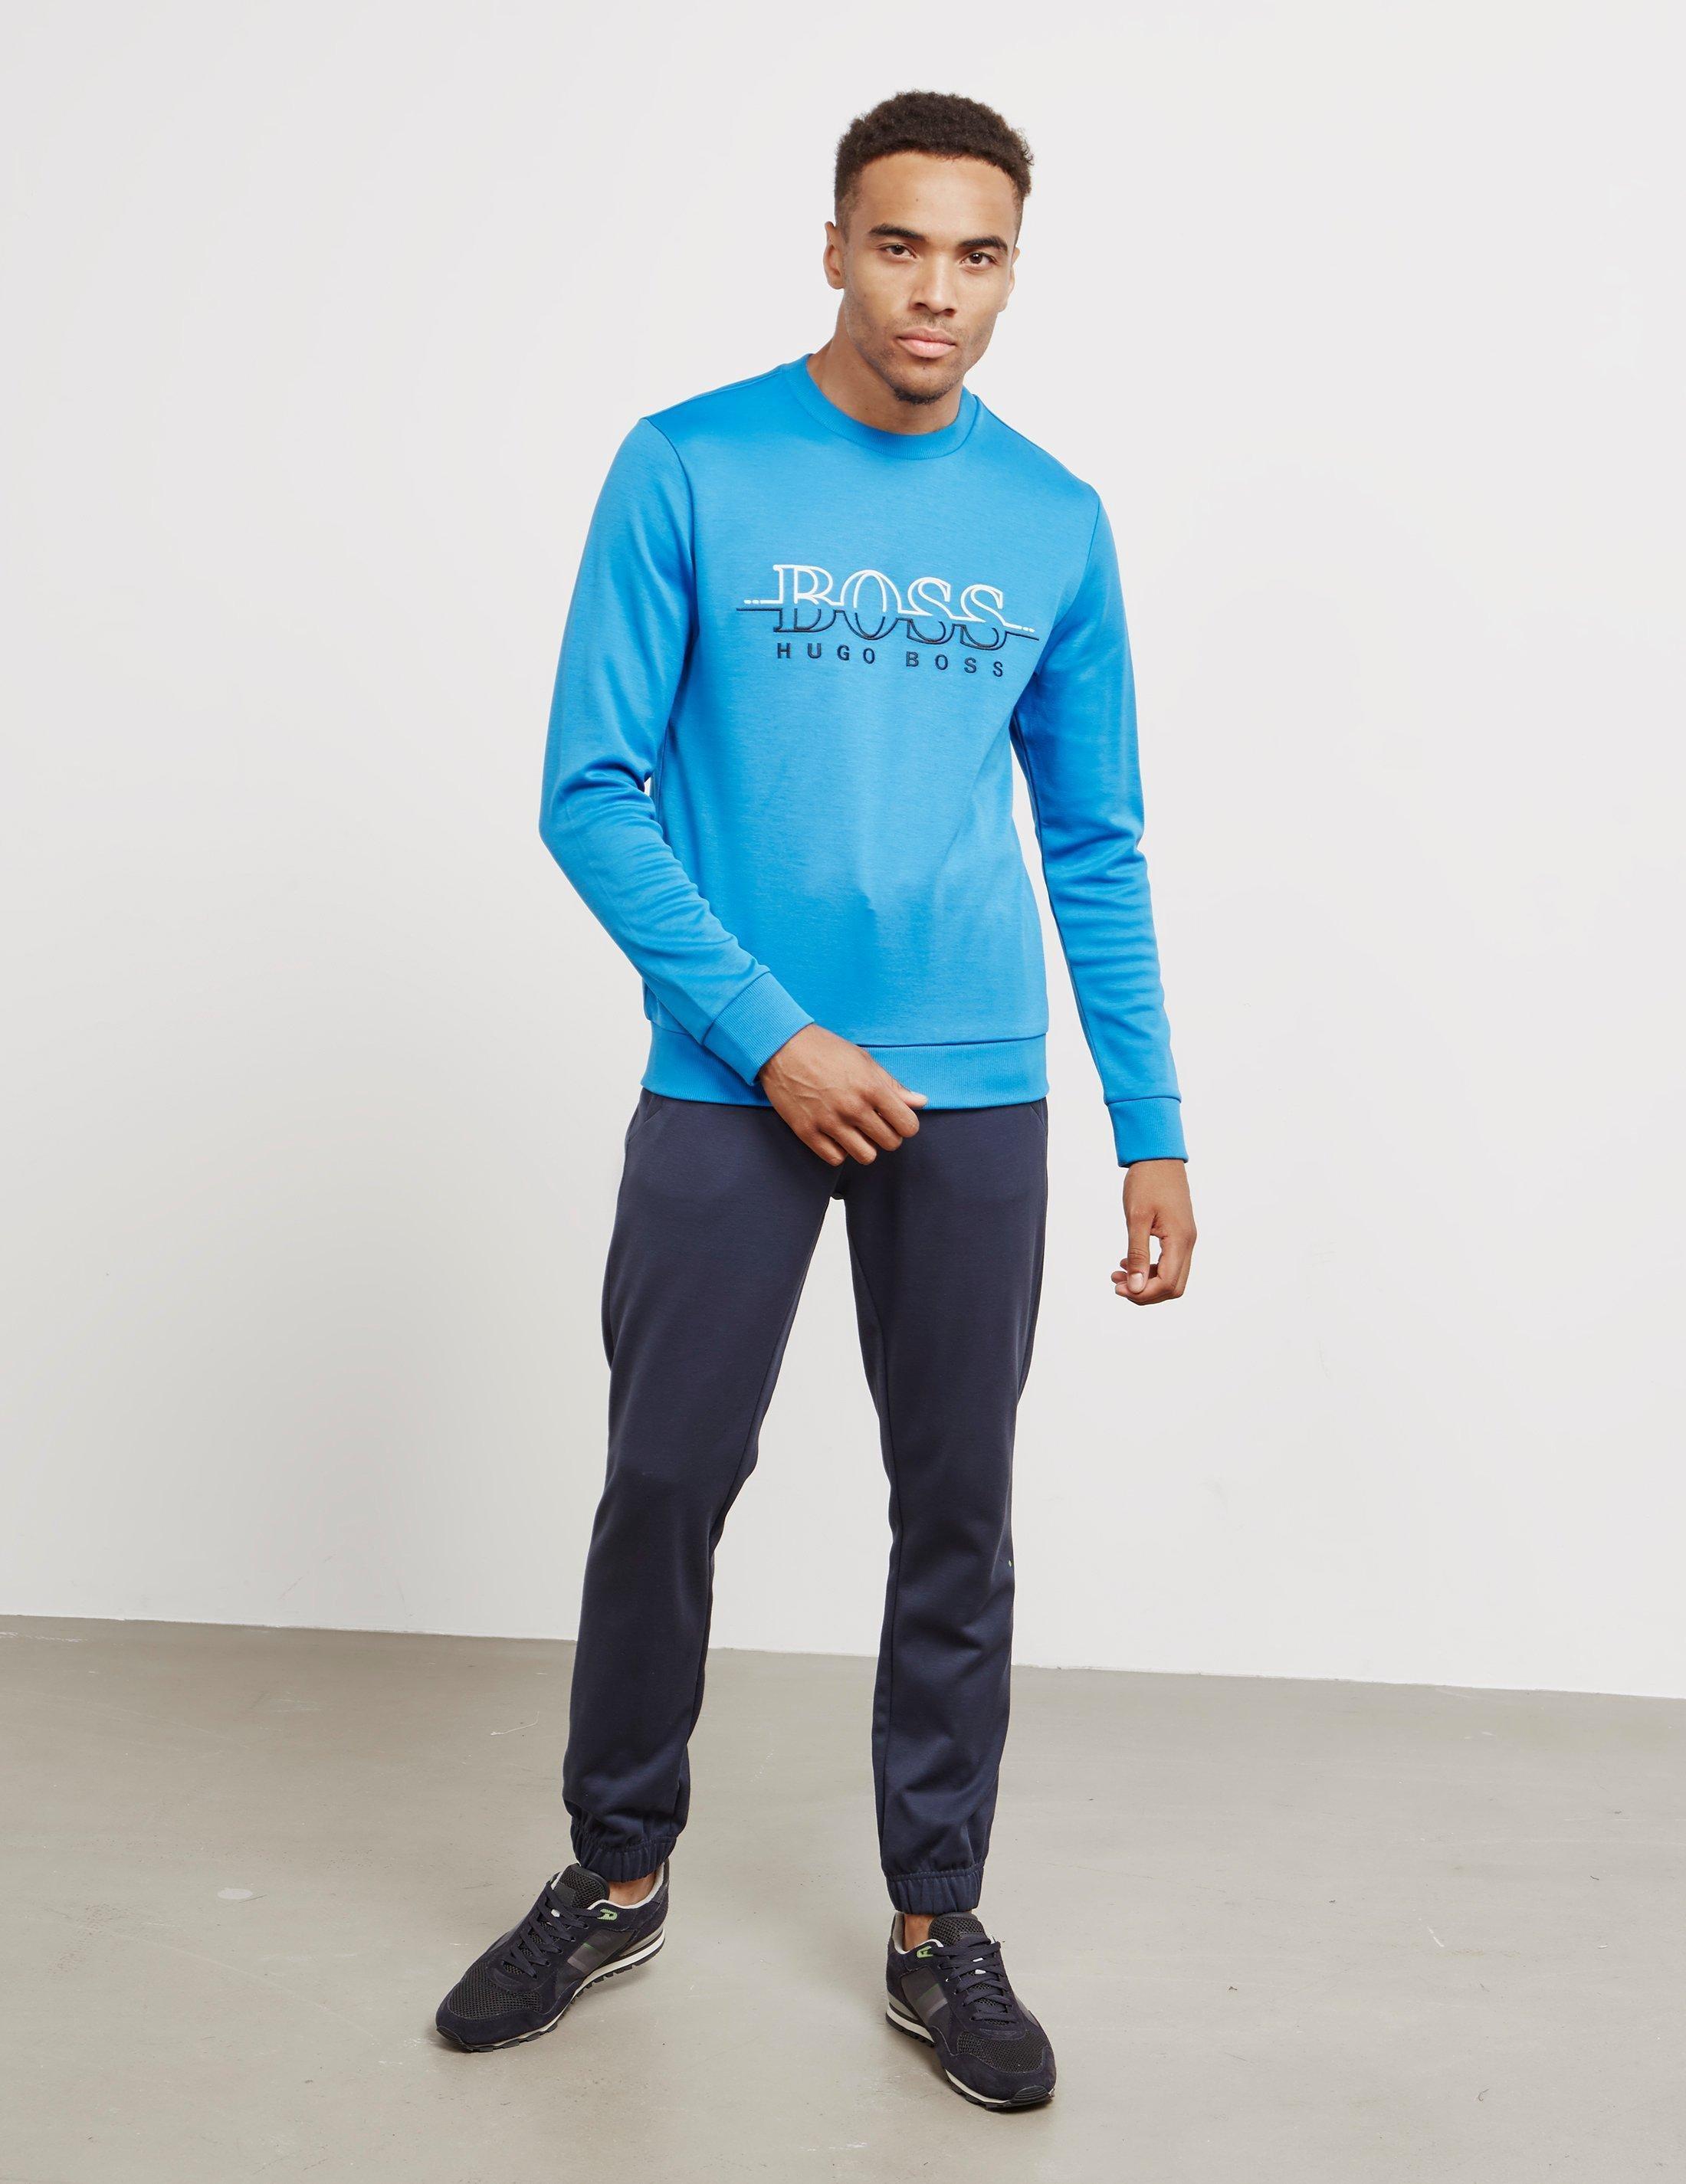 3948e45ae Lyst - BOSS Salbo Crew Neck Sweatshirt Blue in Blue for Men